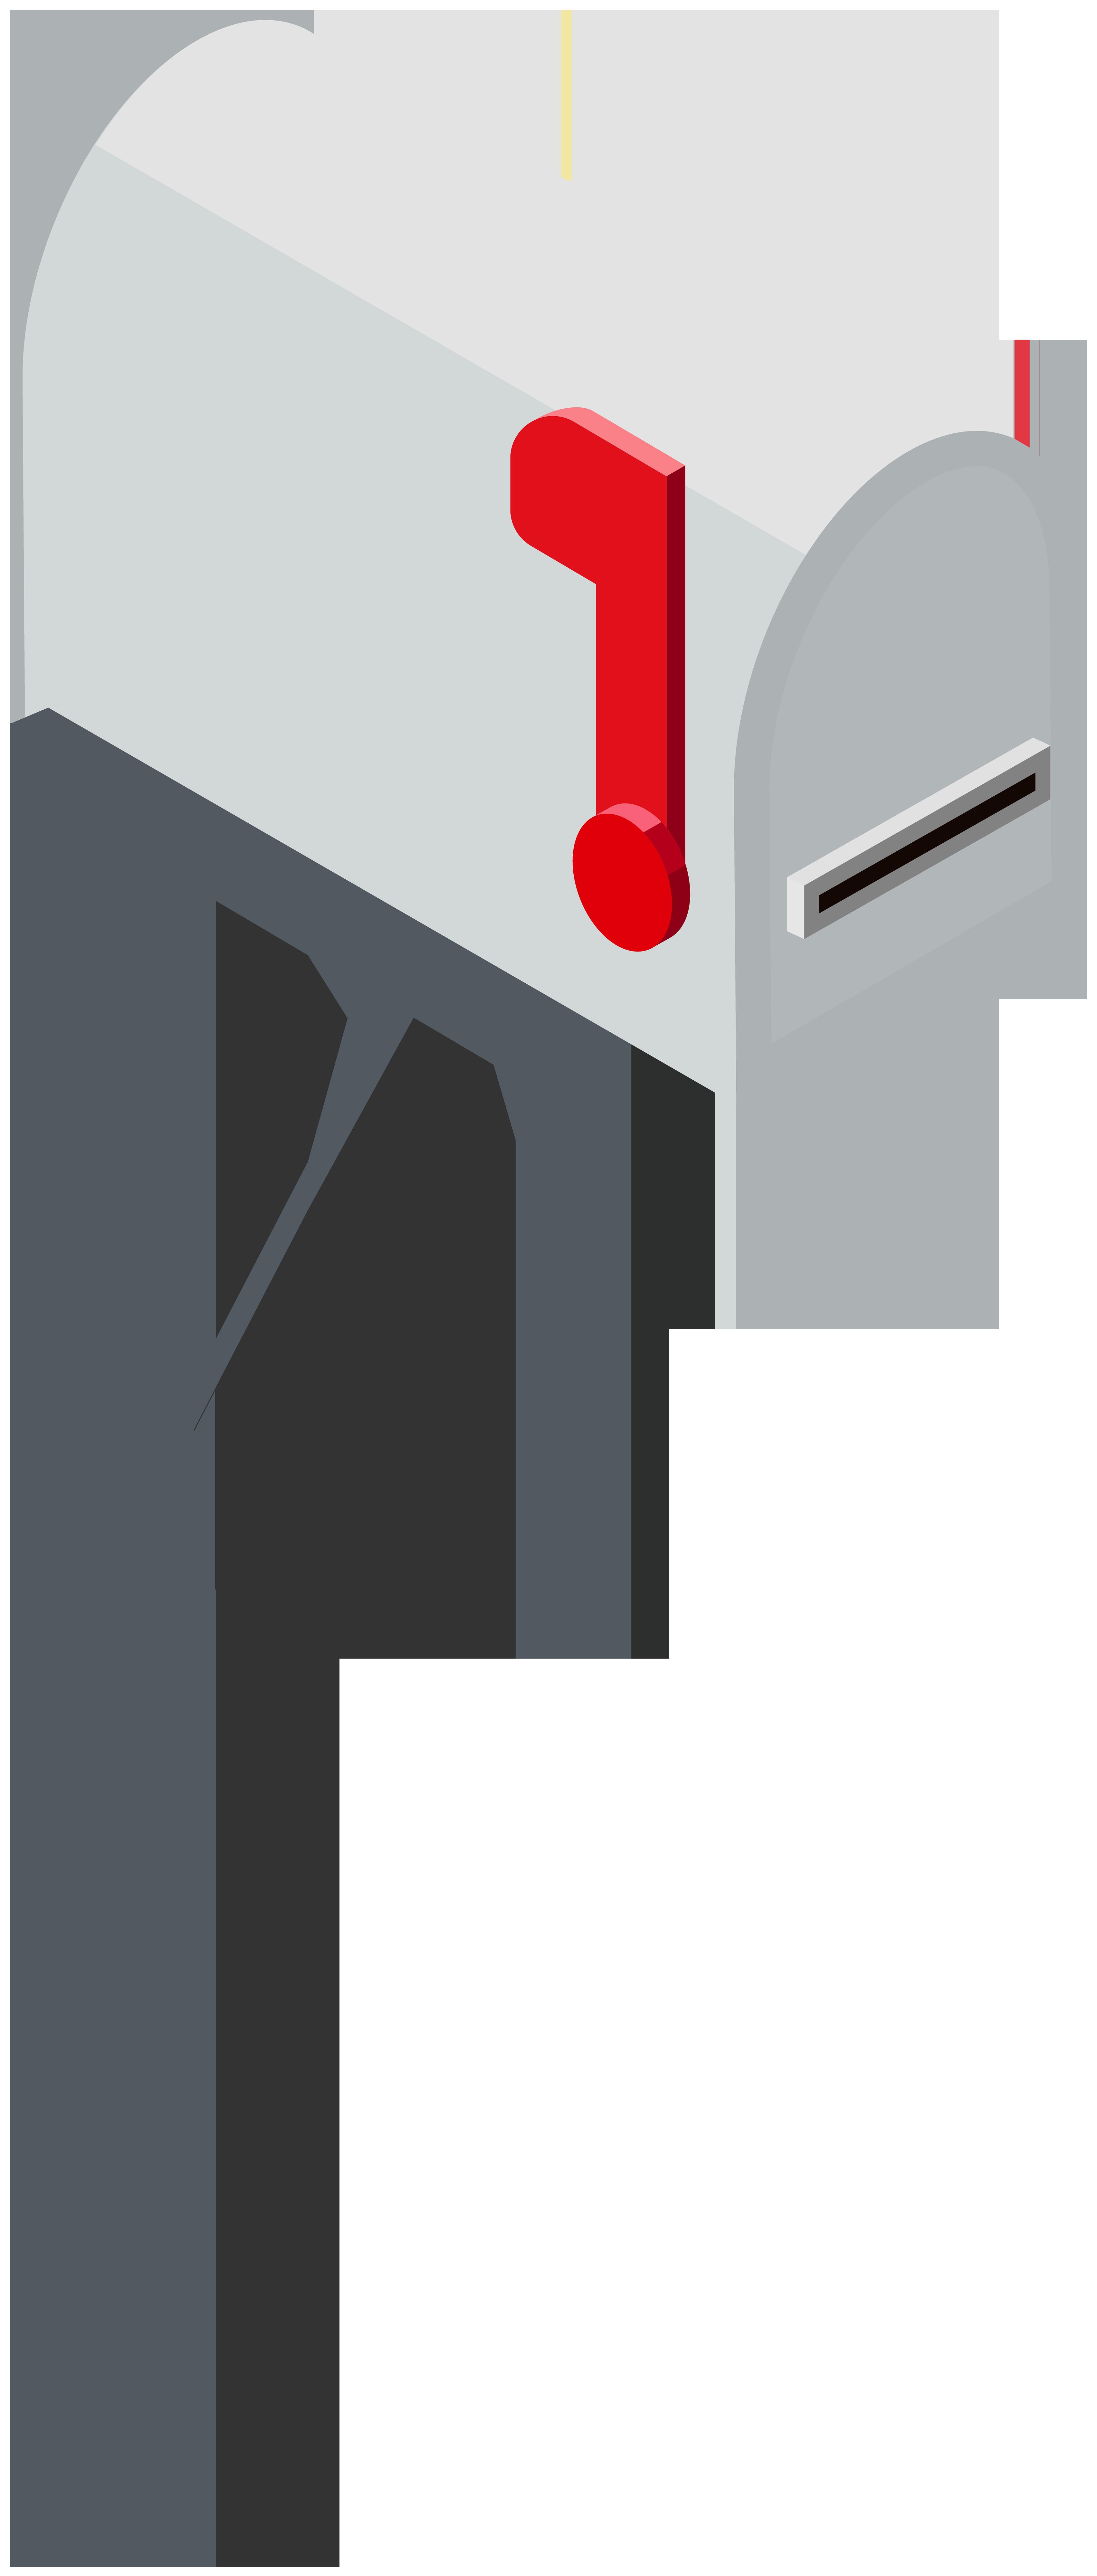 Mail clipart mailbox. Png clip art best